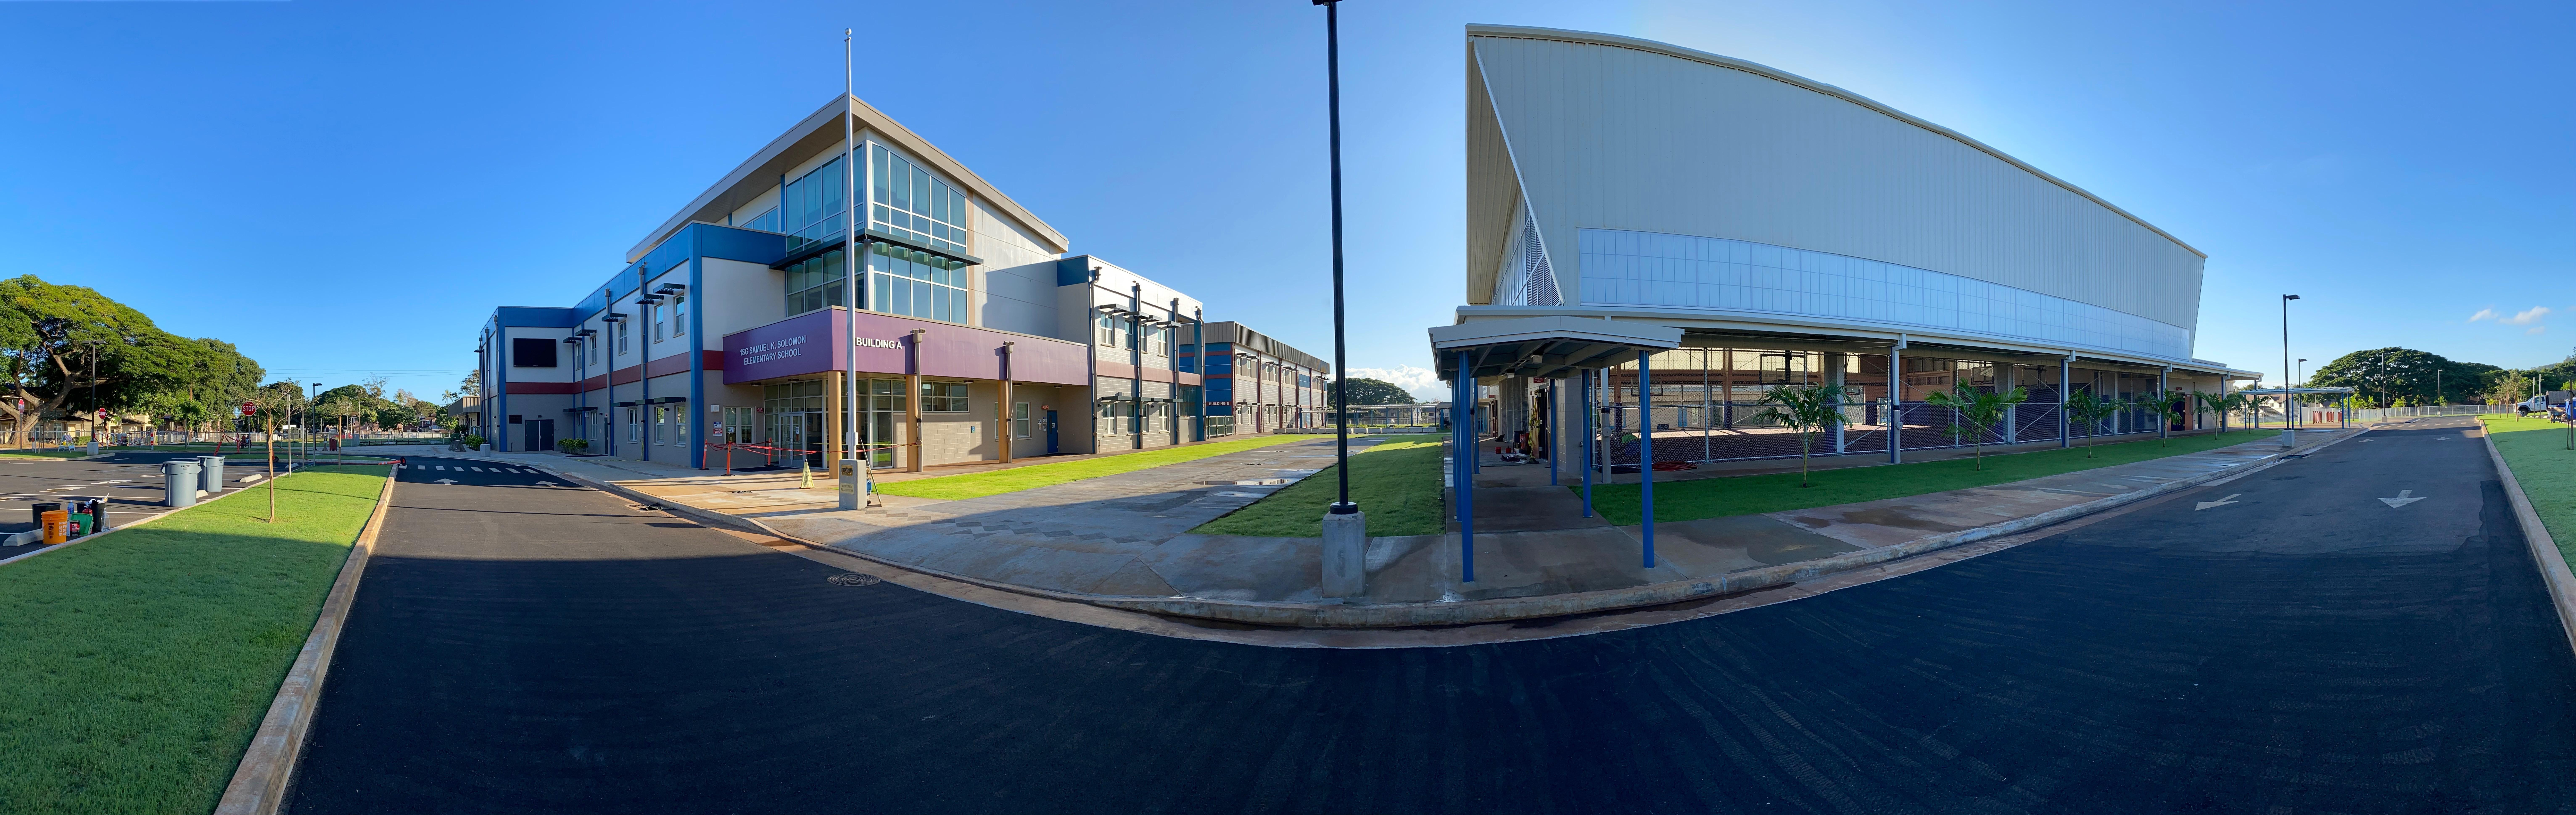 Front of School Image